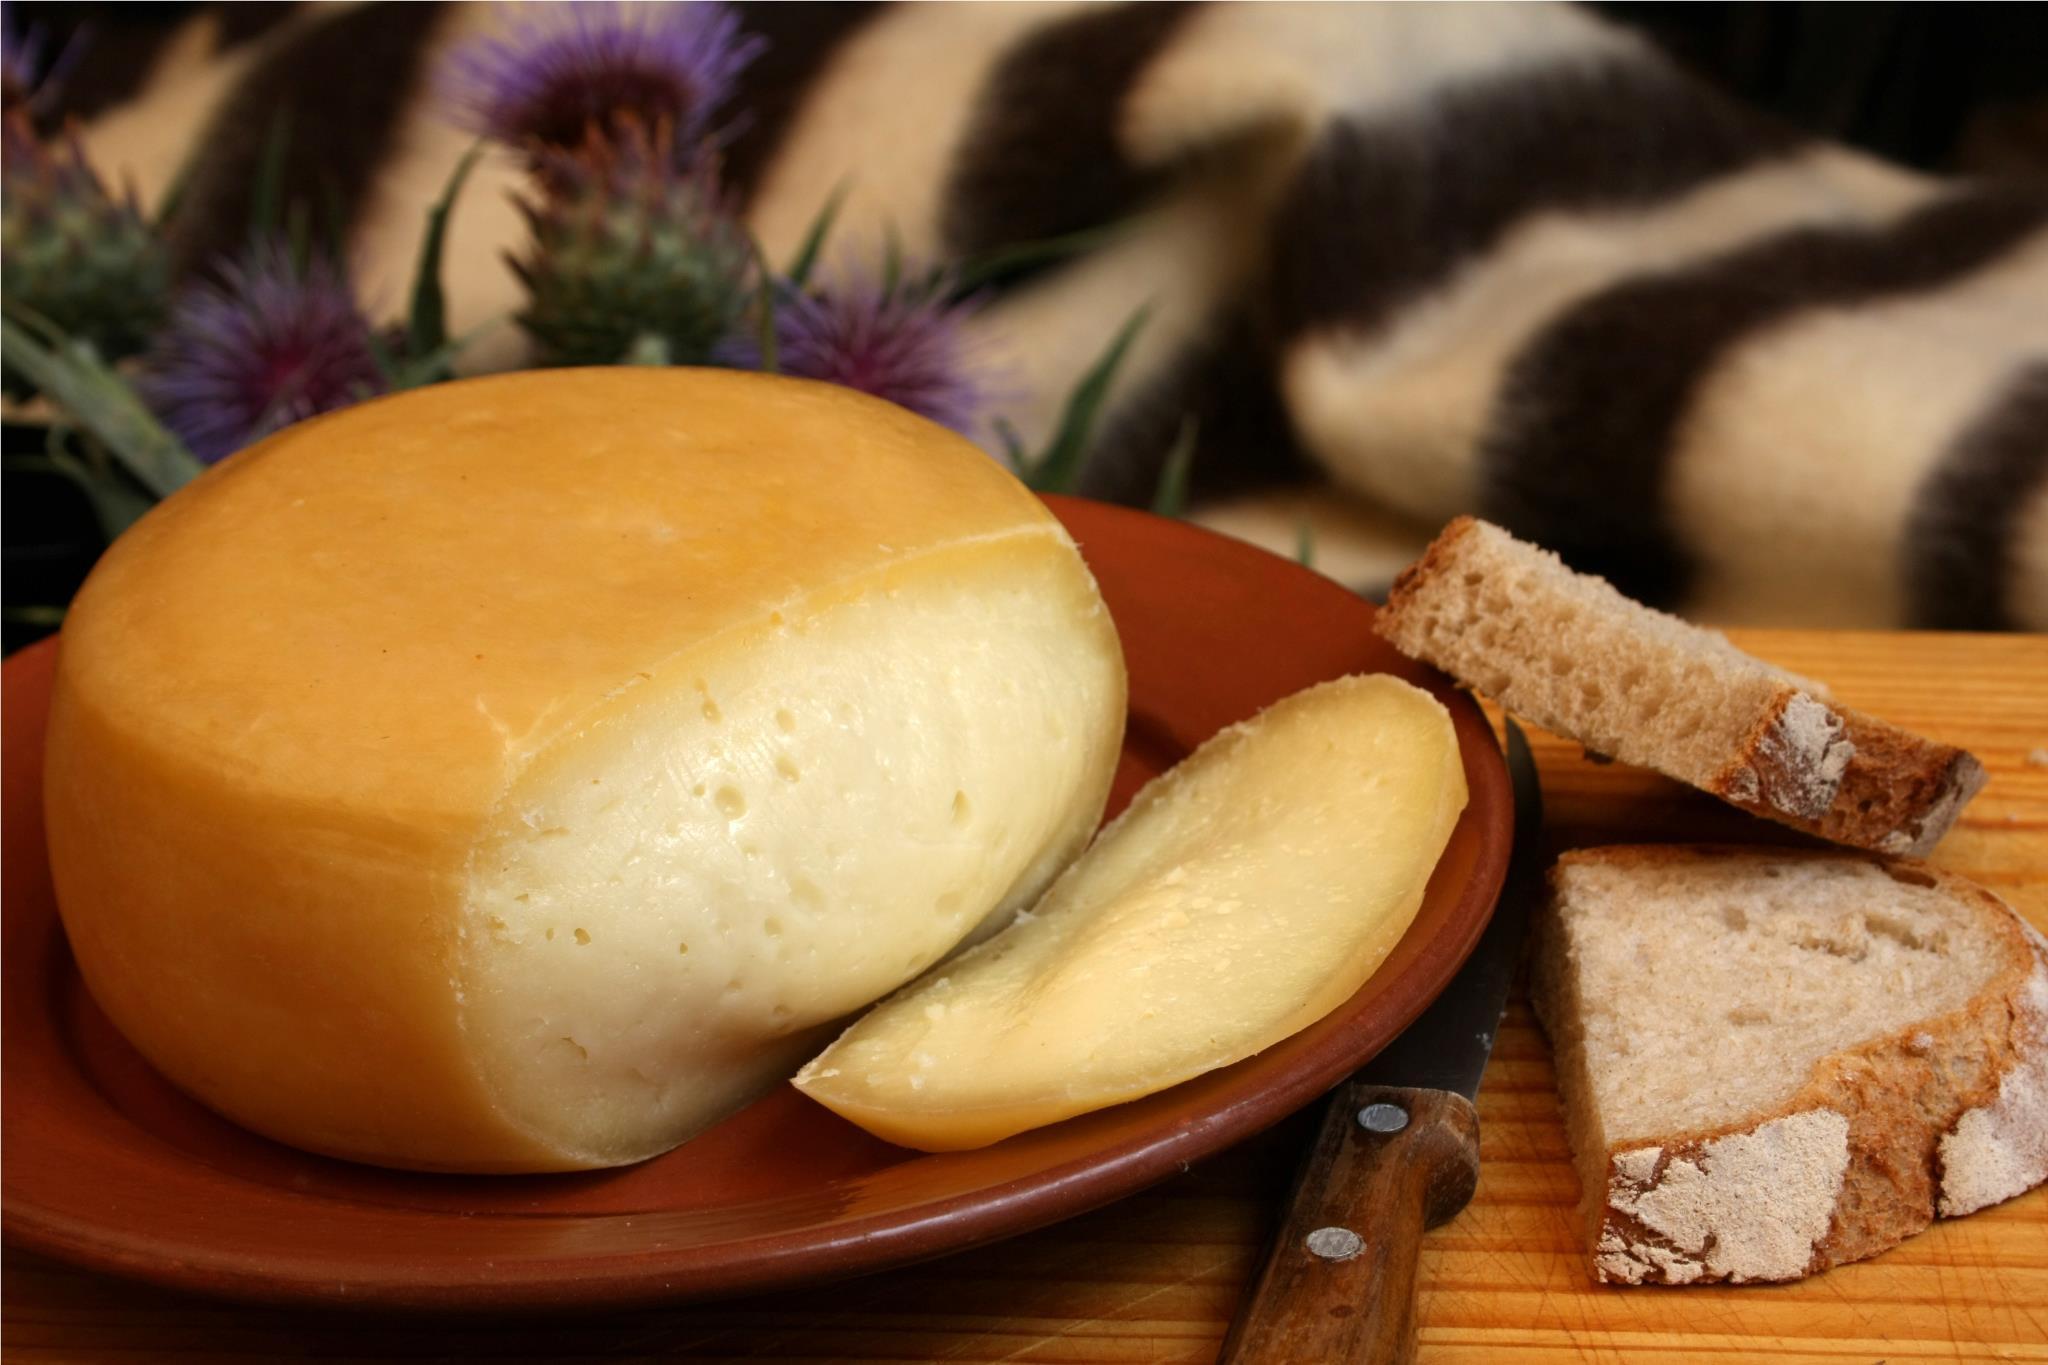 queijo da serra 5109.jpg